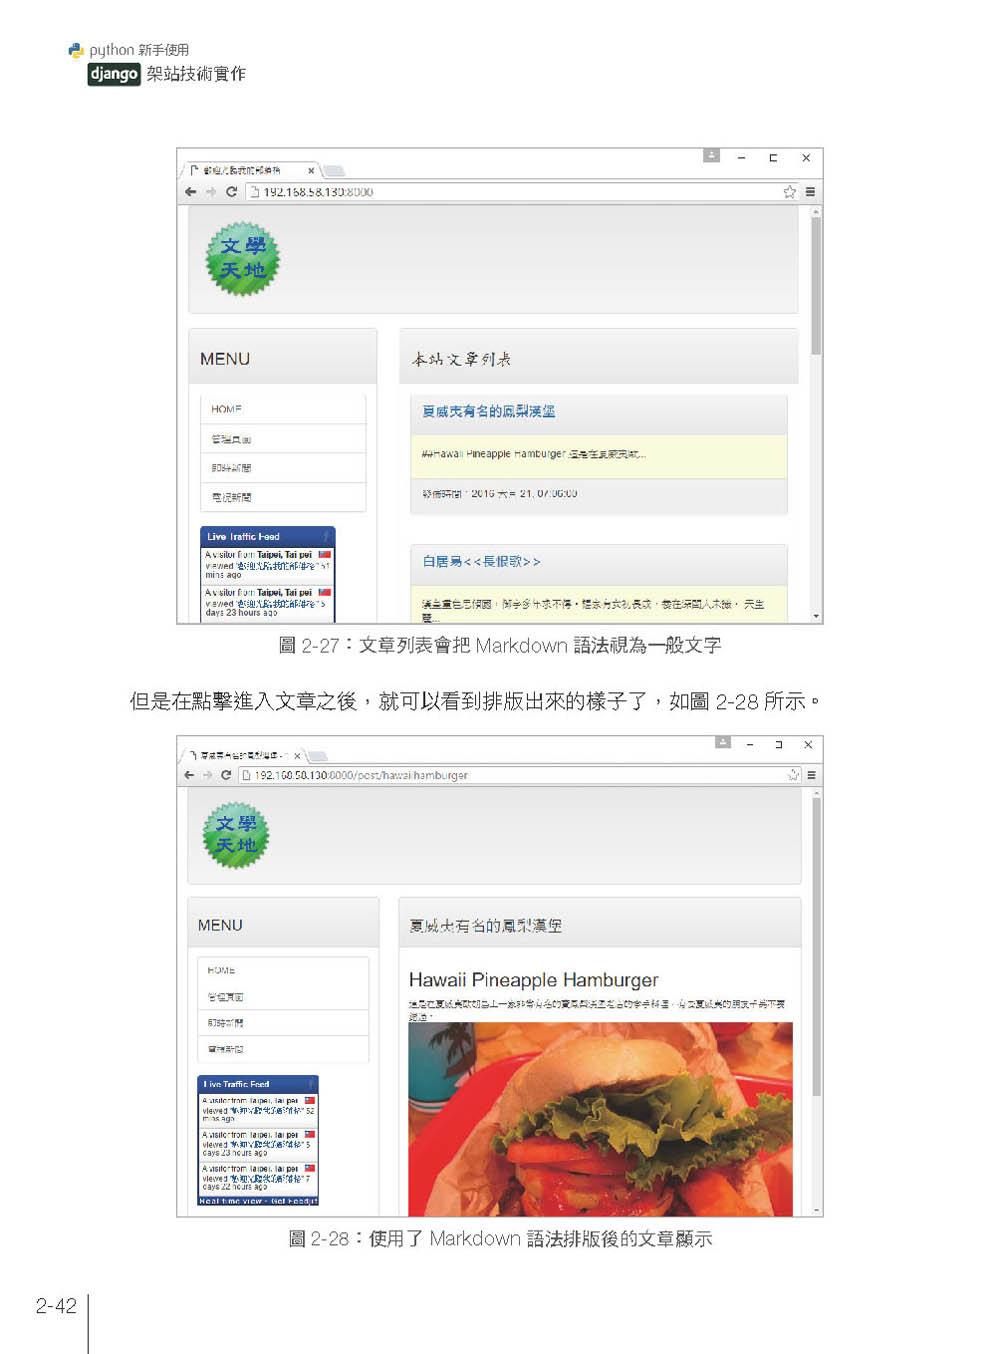 Python 新手使用 Django 架站技術實作:活用 Django 2.0 Web Framework 建構動態網站的 16堂課-preview-5